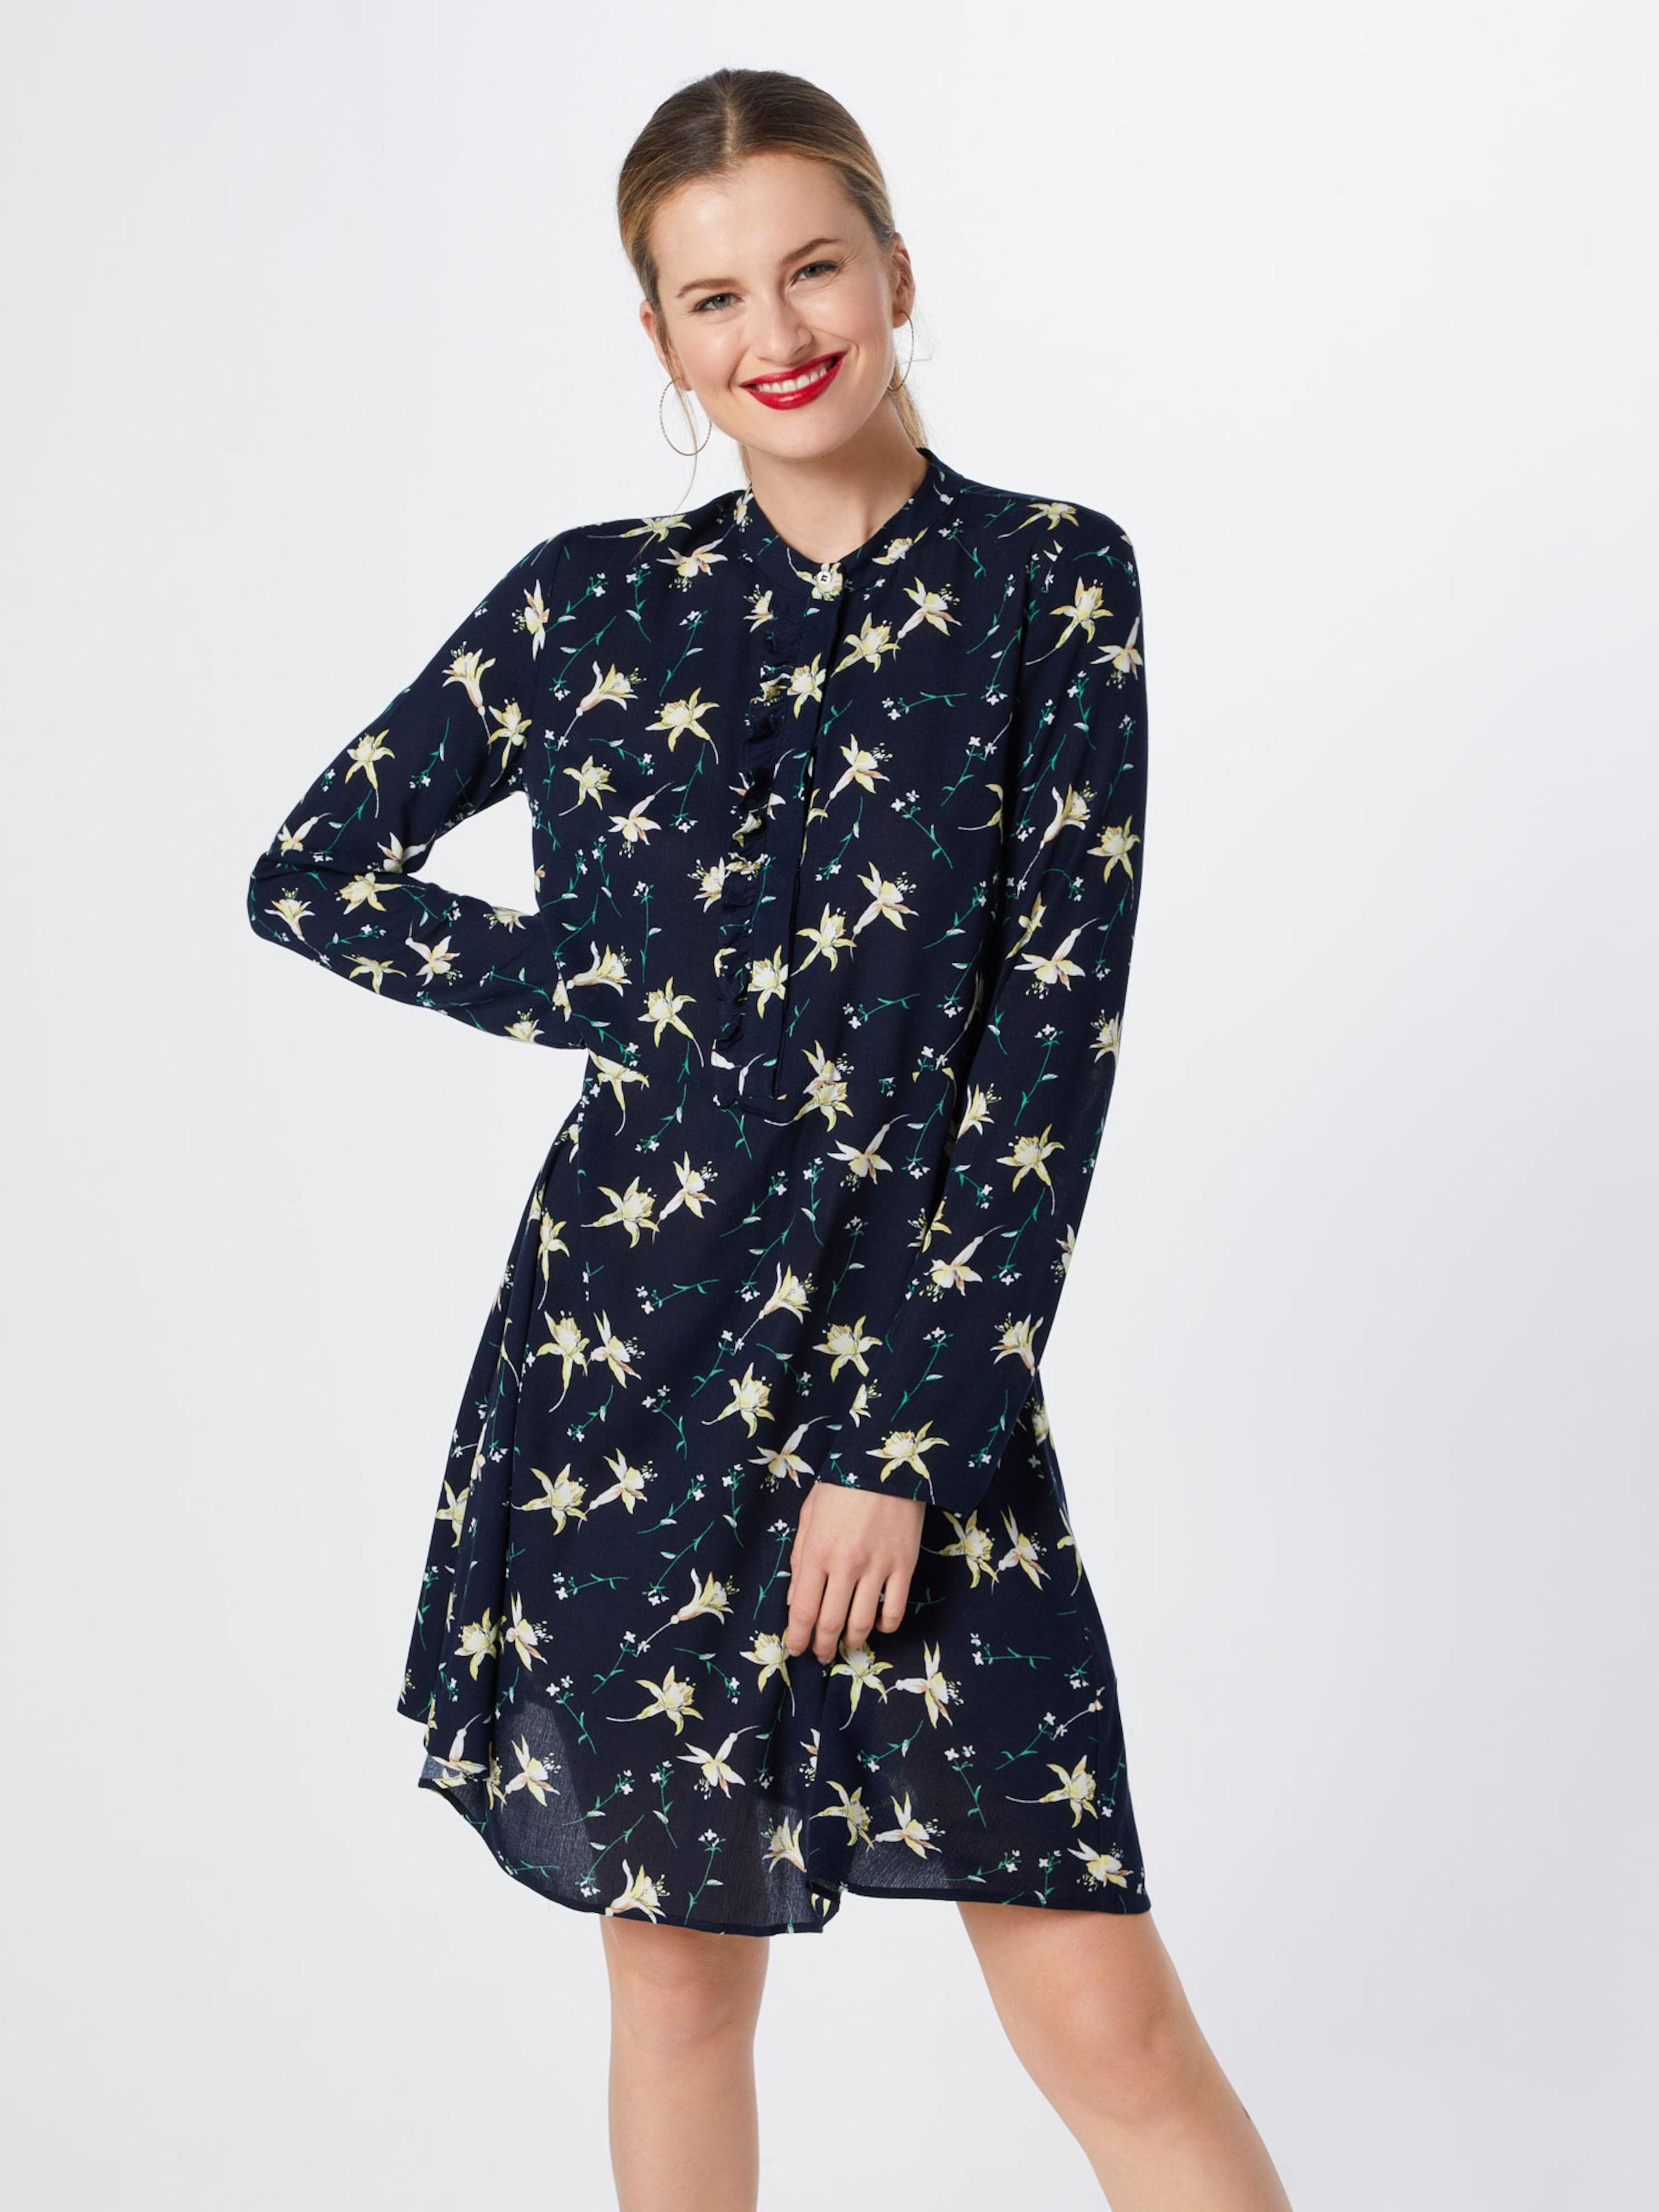 En Marine Vila Bleu chemise Robe 'alitta' YW9EH2IeD